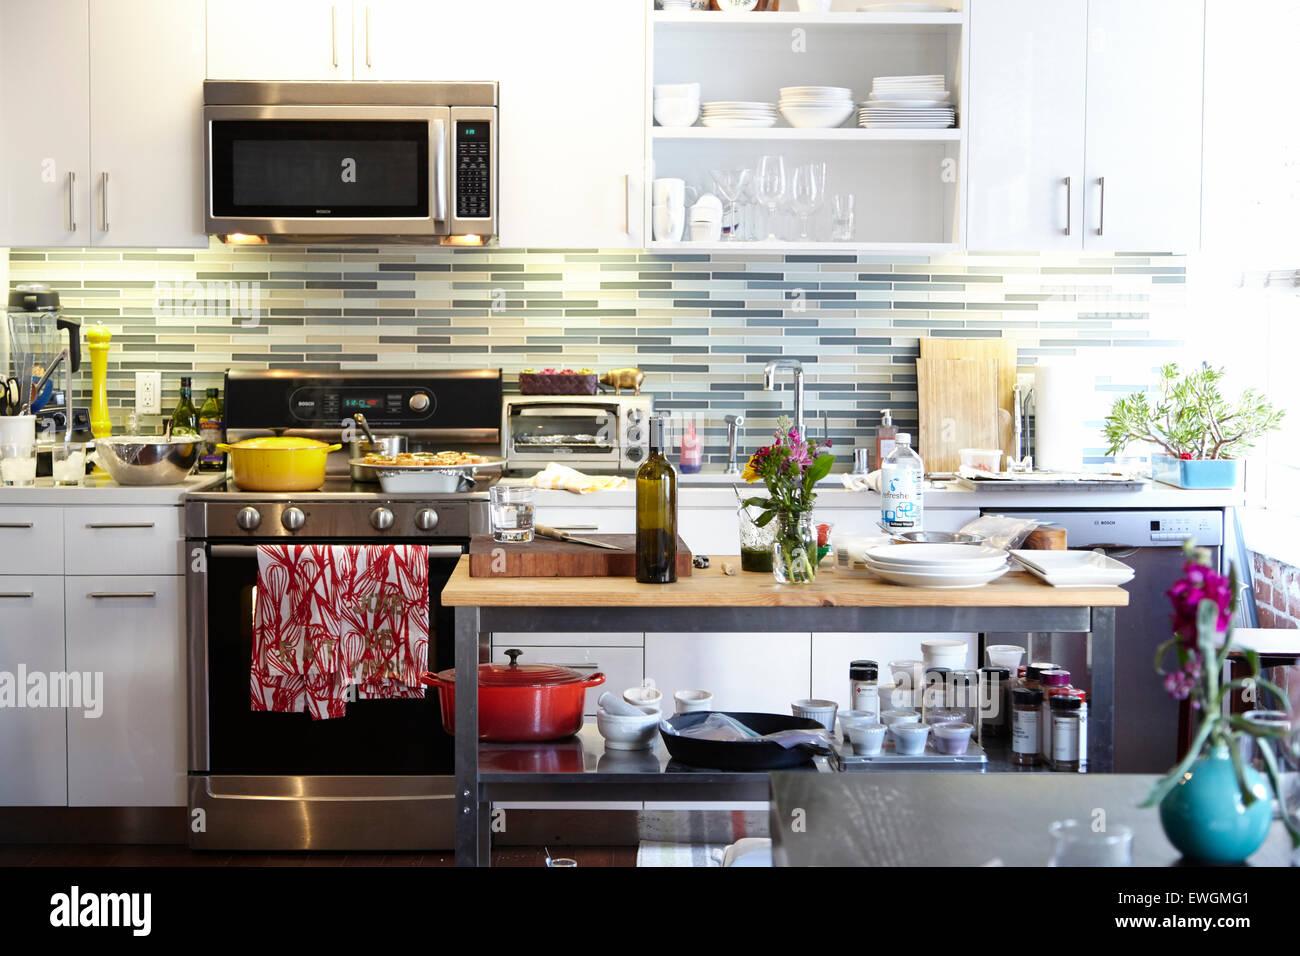 modern kitchen yellow pot red towel modern appliances white kitchen cabinets glass back splash wood island - Stock Image